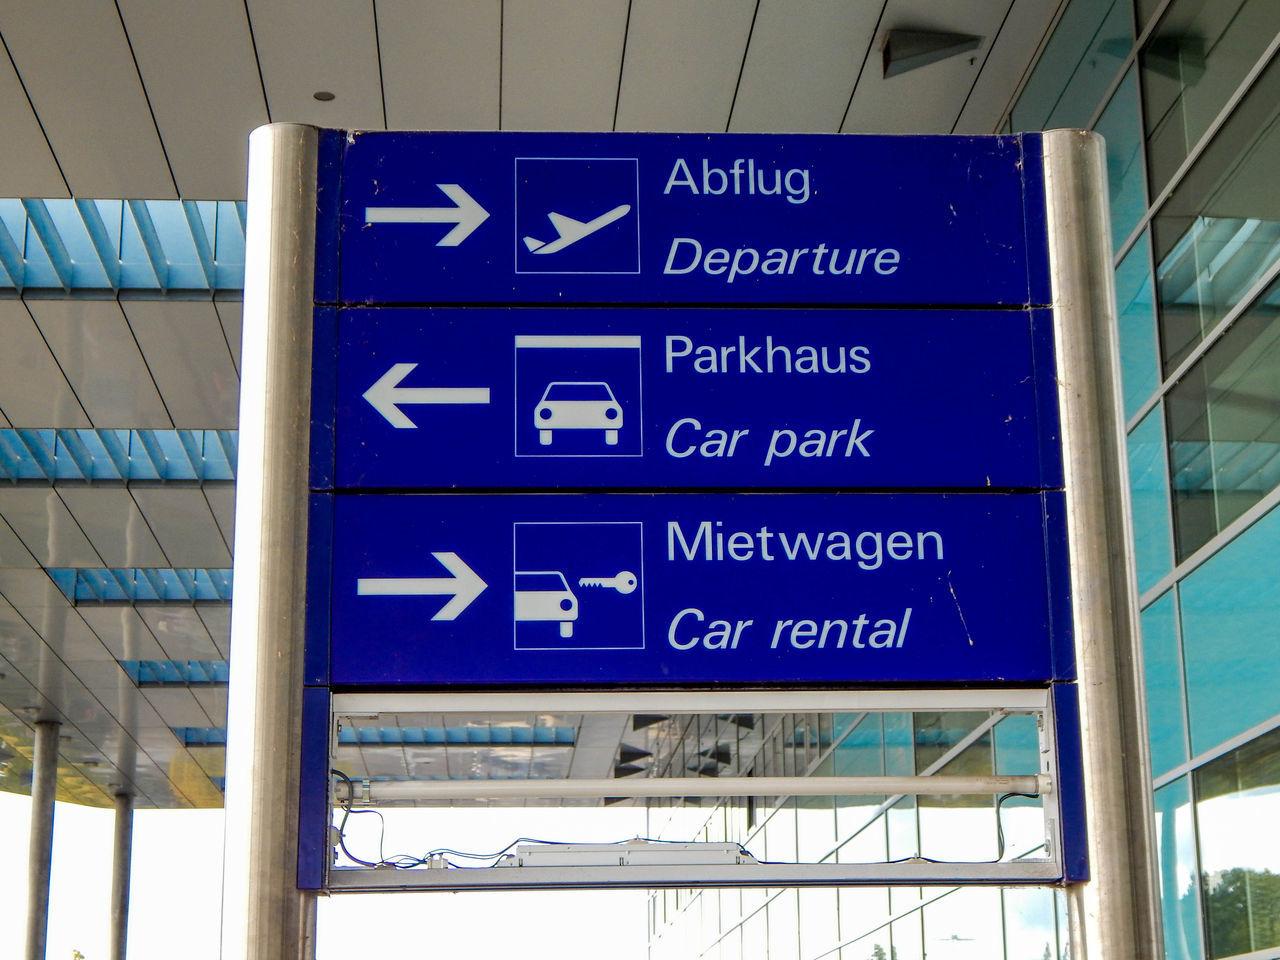 Abflug Airport Ankunft Arrival Departure Board Blue Car Rental Flug Guidance Hinweis Information Sign Journey Low Angle View Mietwagen No People Outdoors Parken Schild Text Transportation Travel